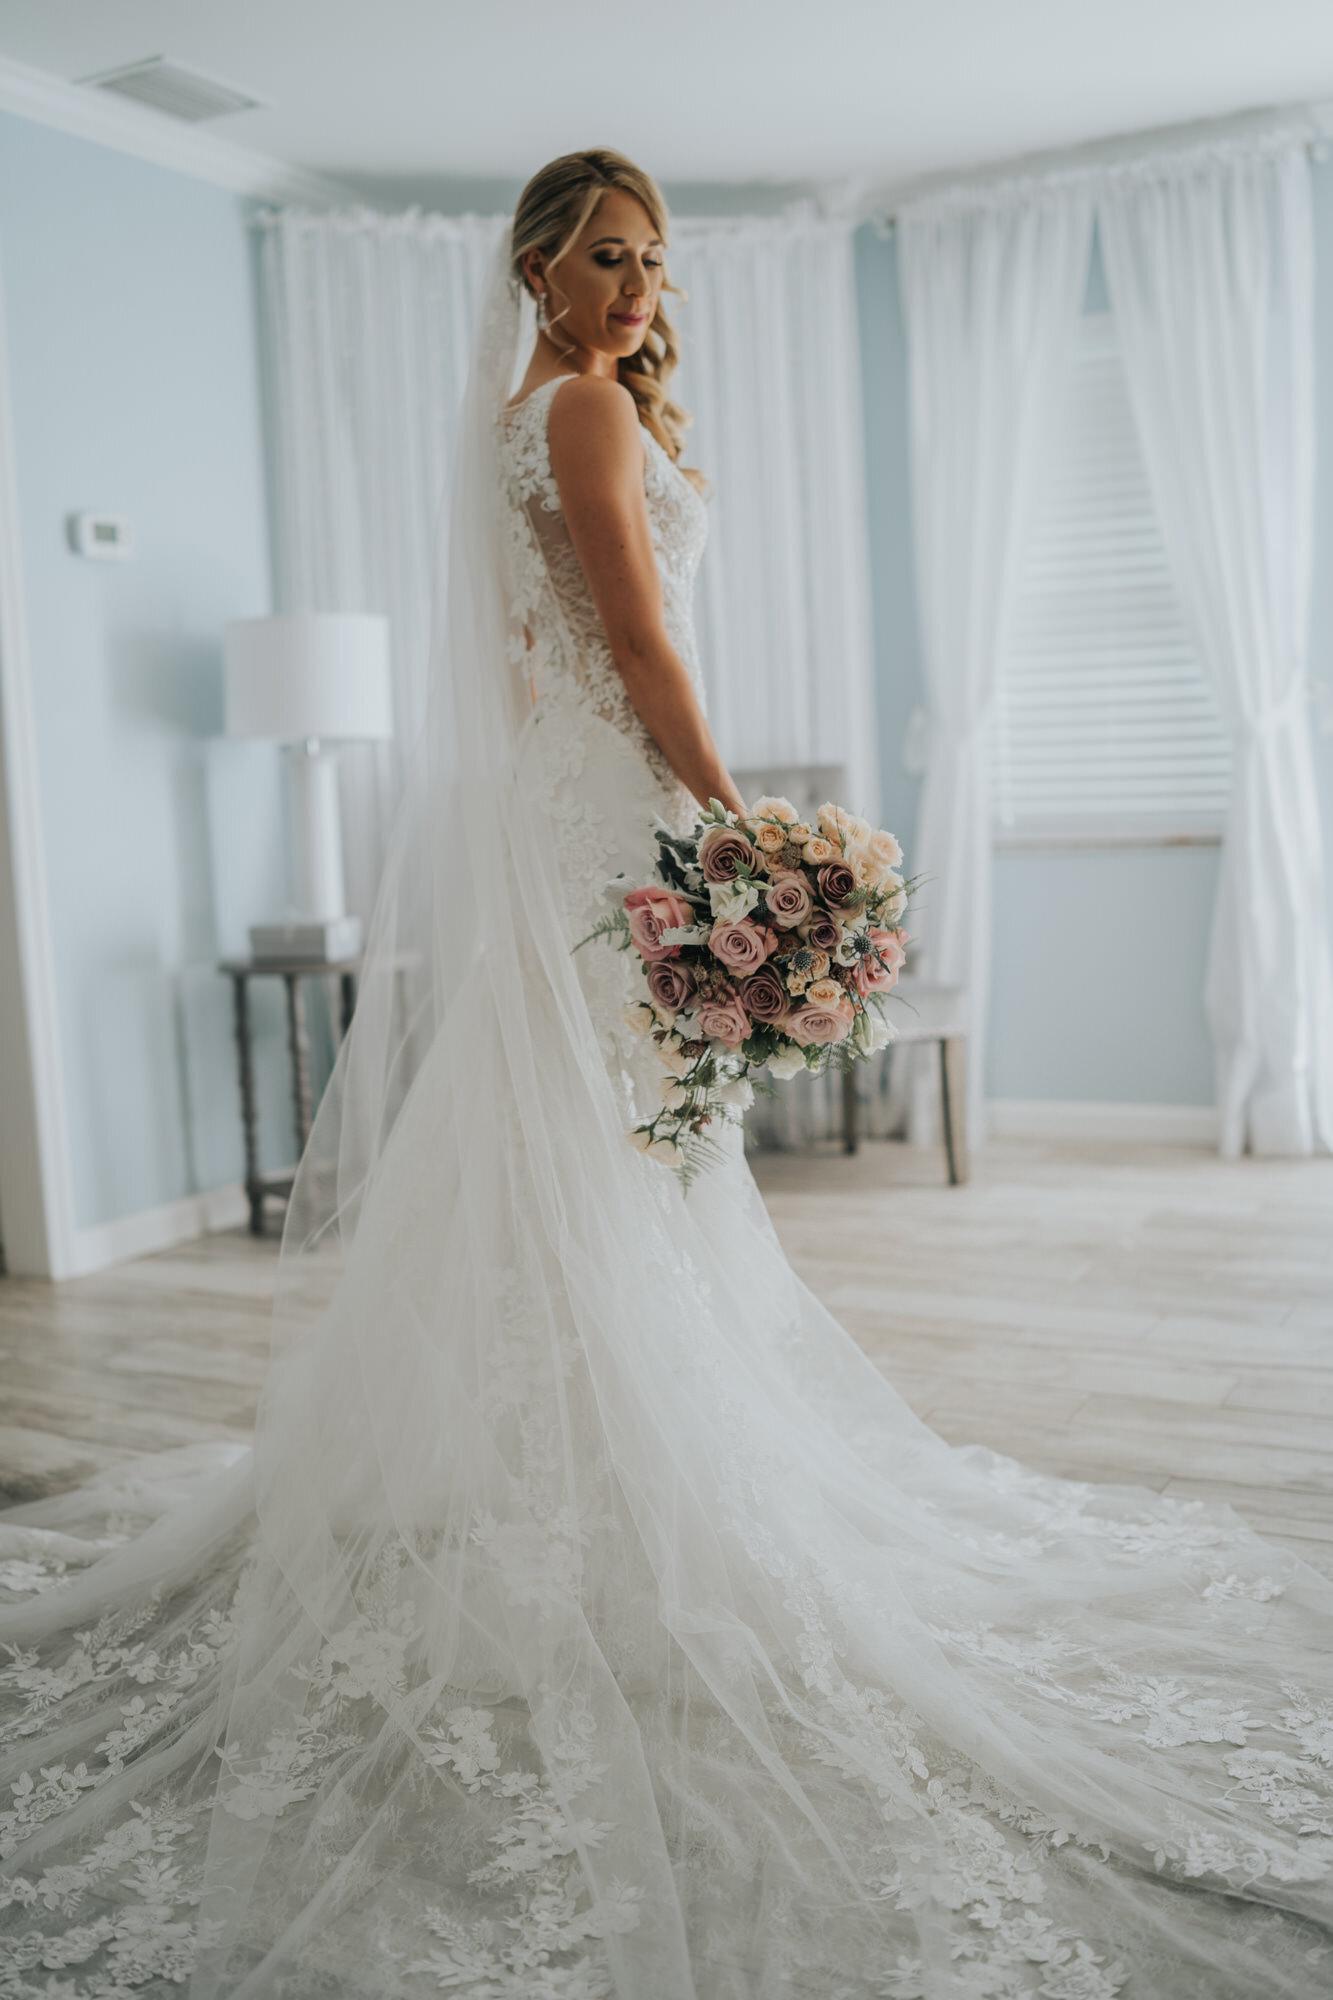 099Sean_Emily_Wedding_3-30-19.jpg